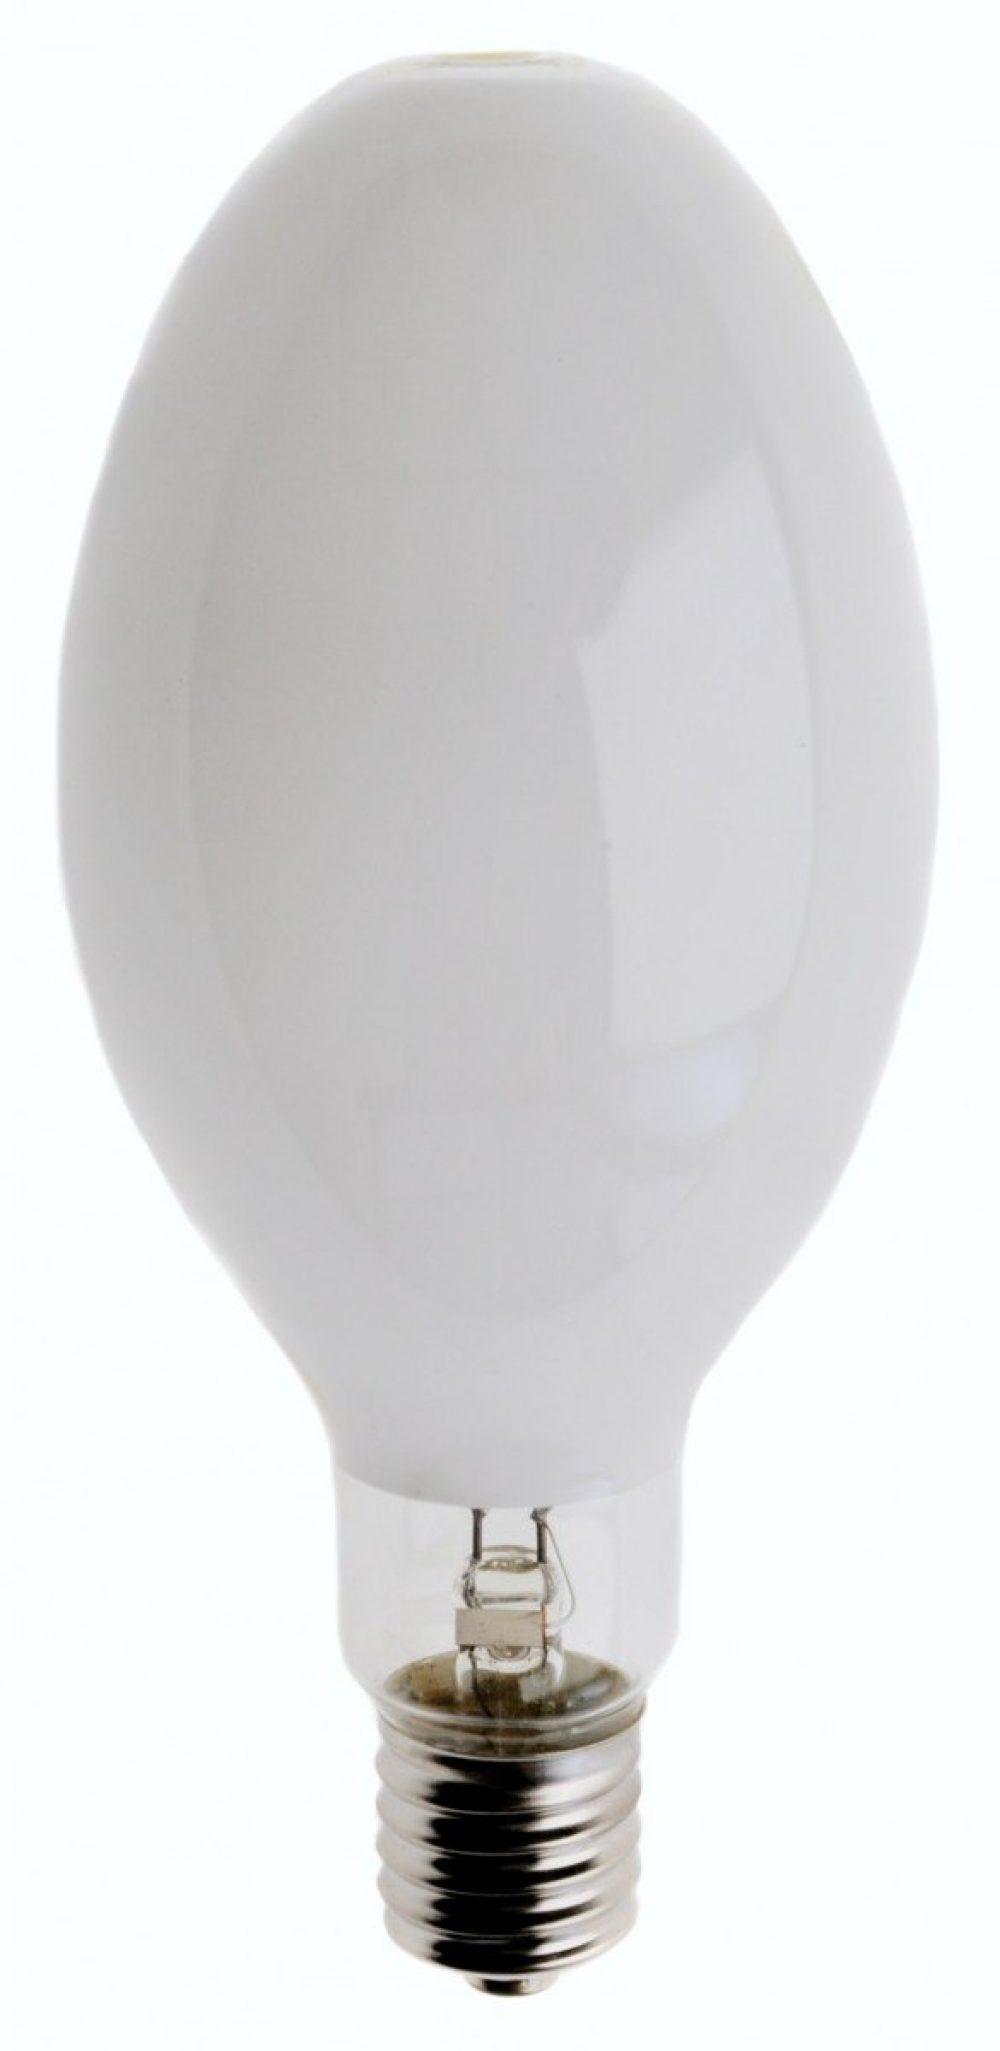 HID Metal Halide Lamps MH400W/ ED120/ C/ U/ 4K/ E40/ COATED/ EUROPE